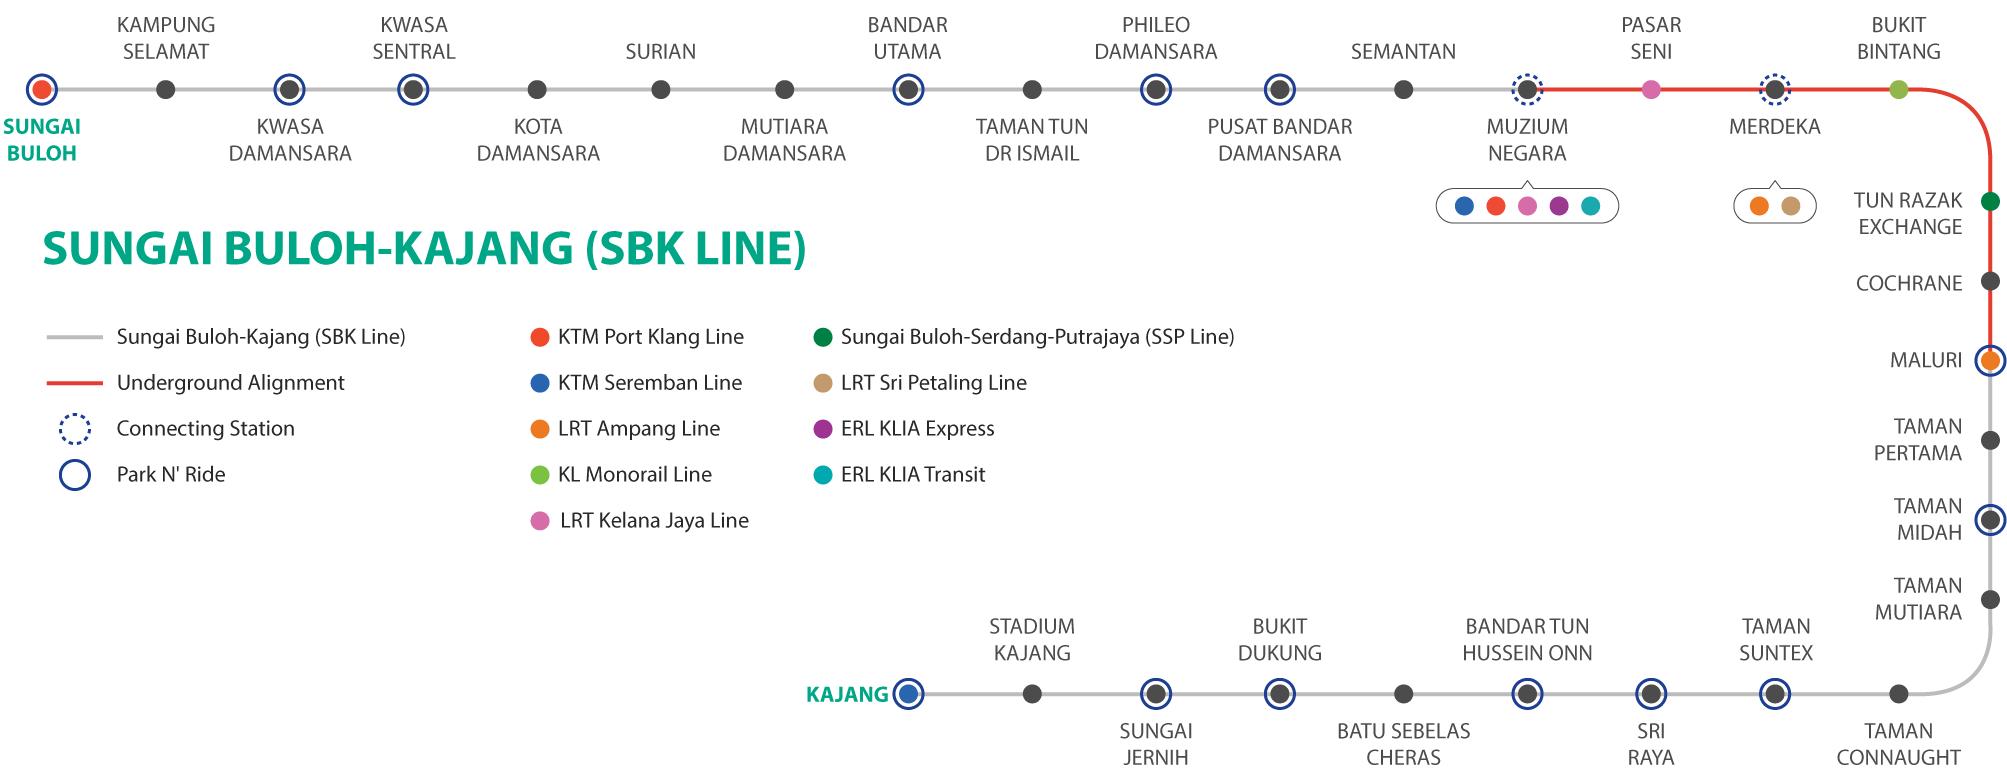 Sungai Buloh – Kajang (SBK Line) – MRT Corp